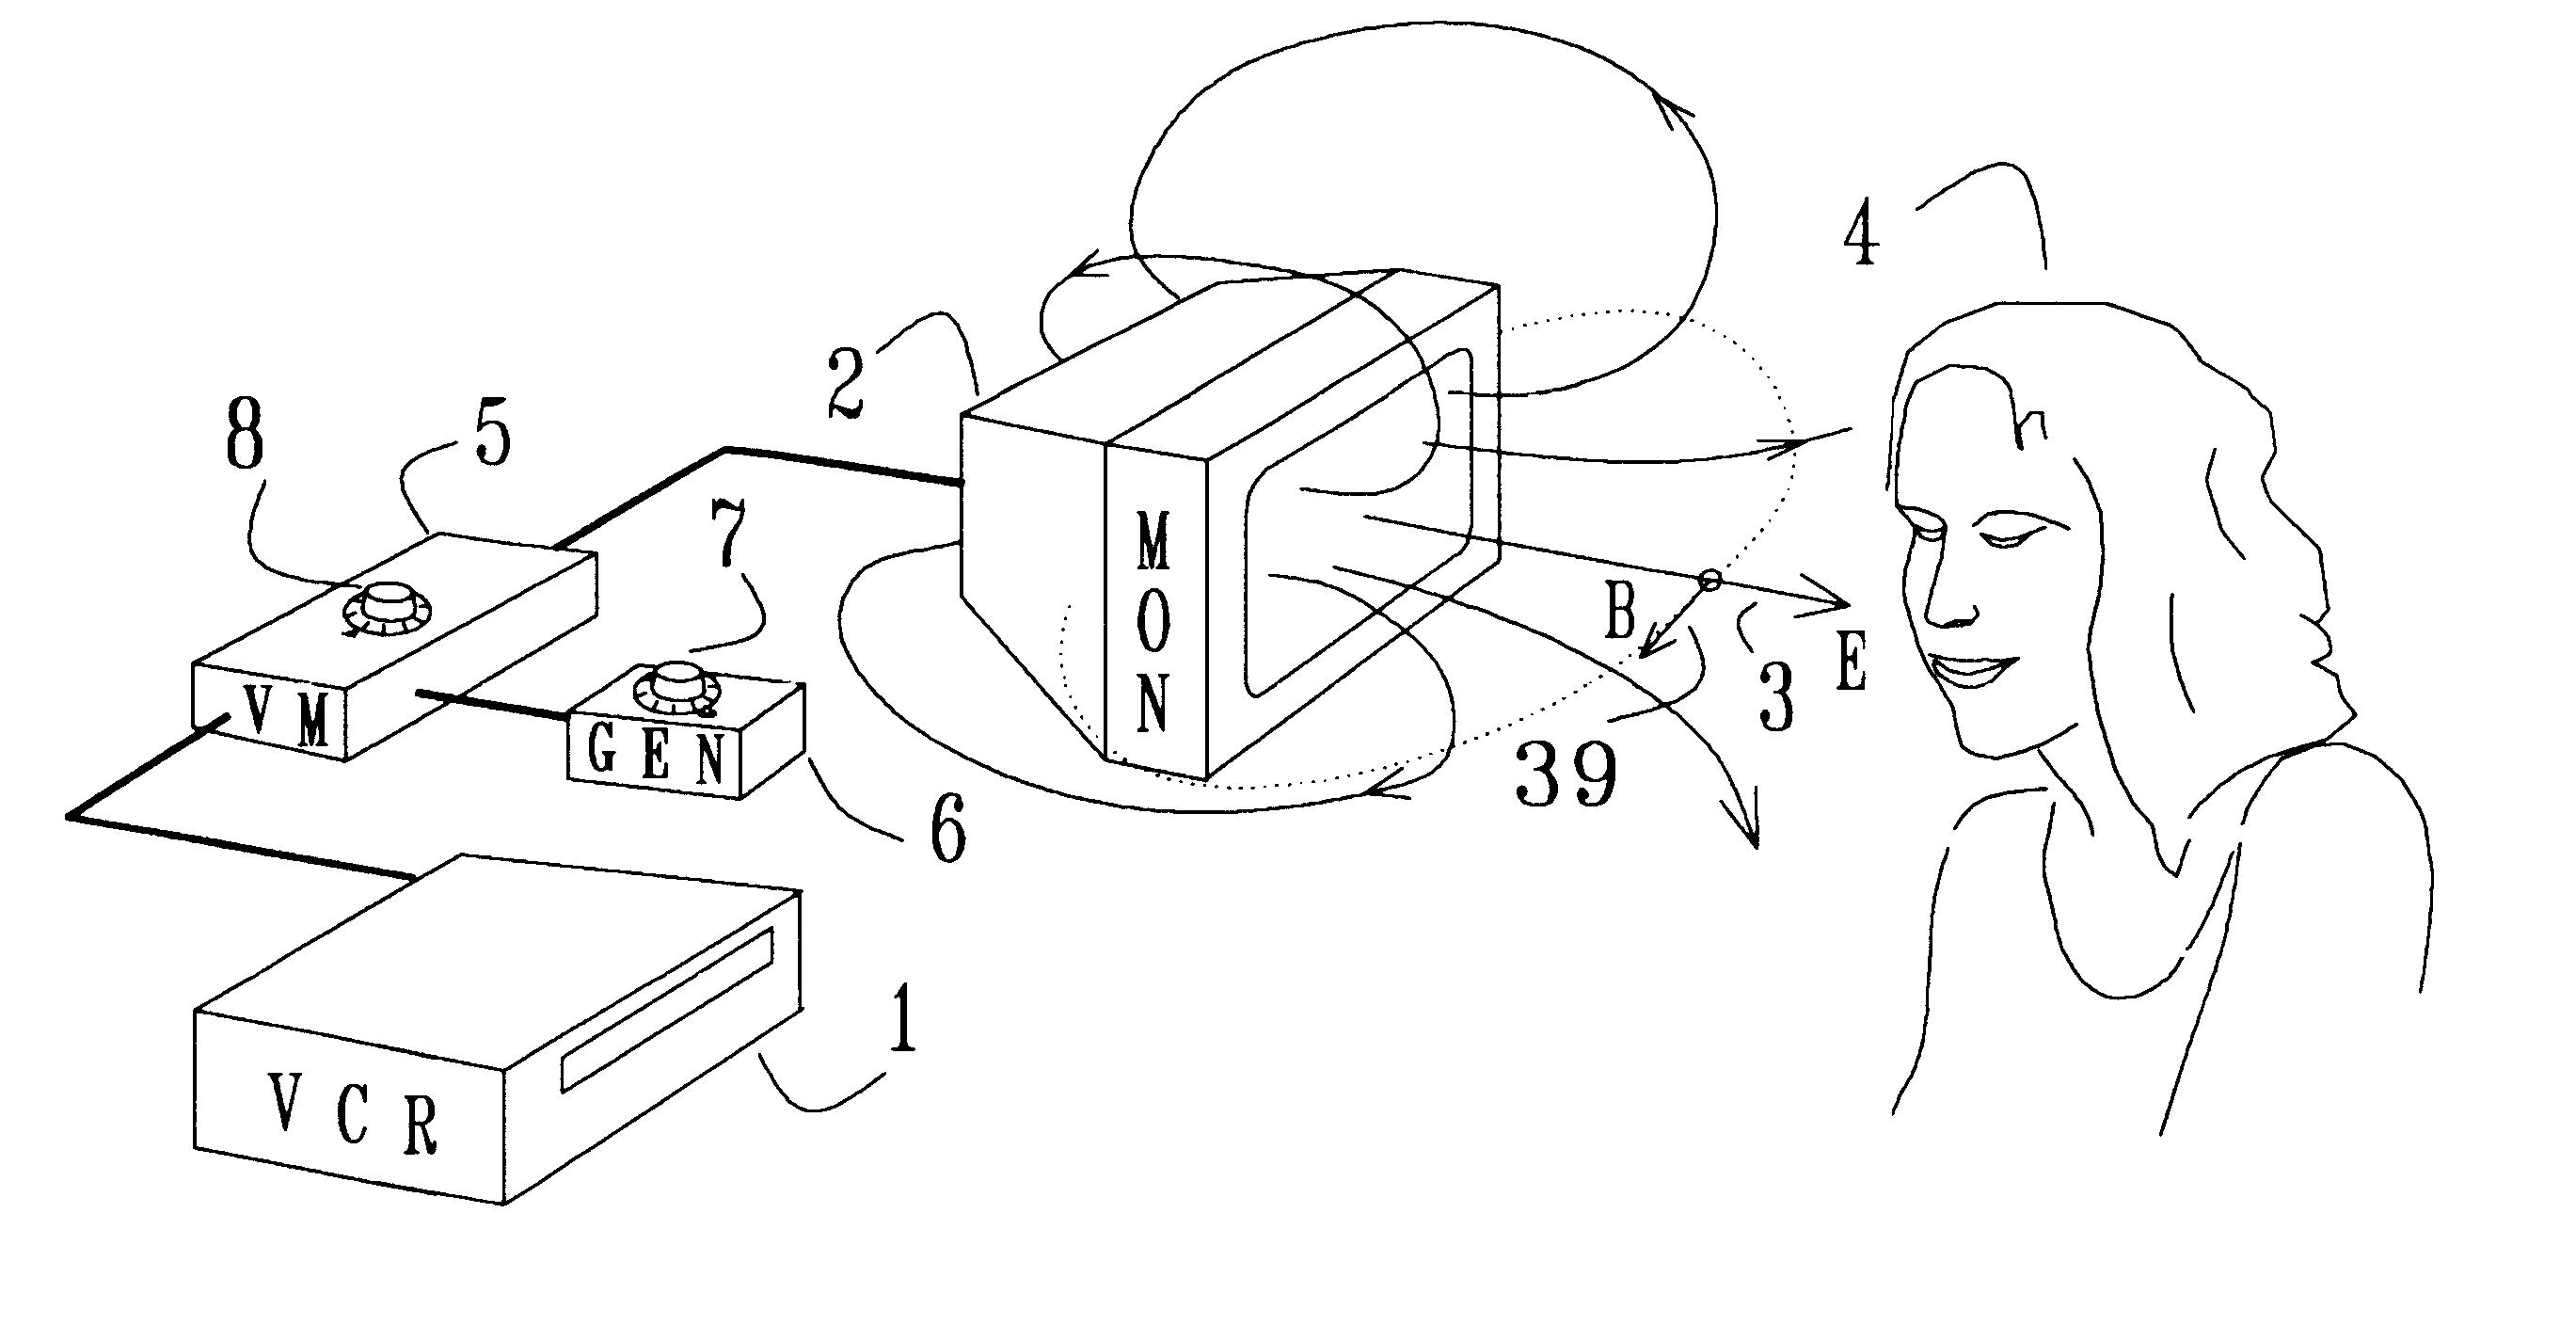 http://patentimages.storage.googleapis.com/US6506148B2/US06506148-20030114-D00000.png